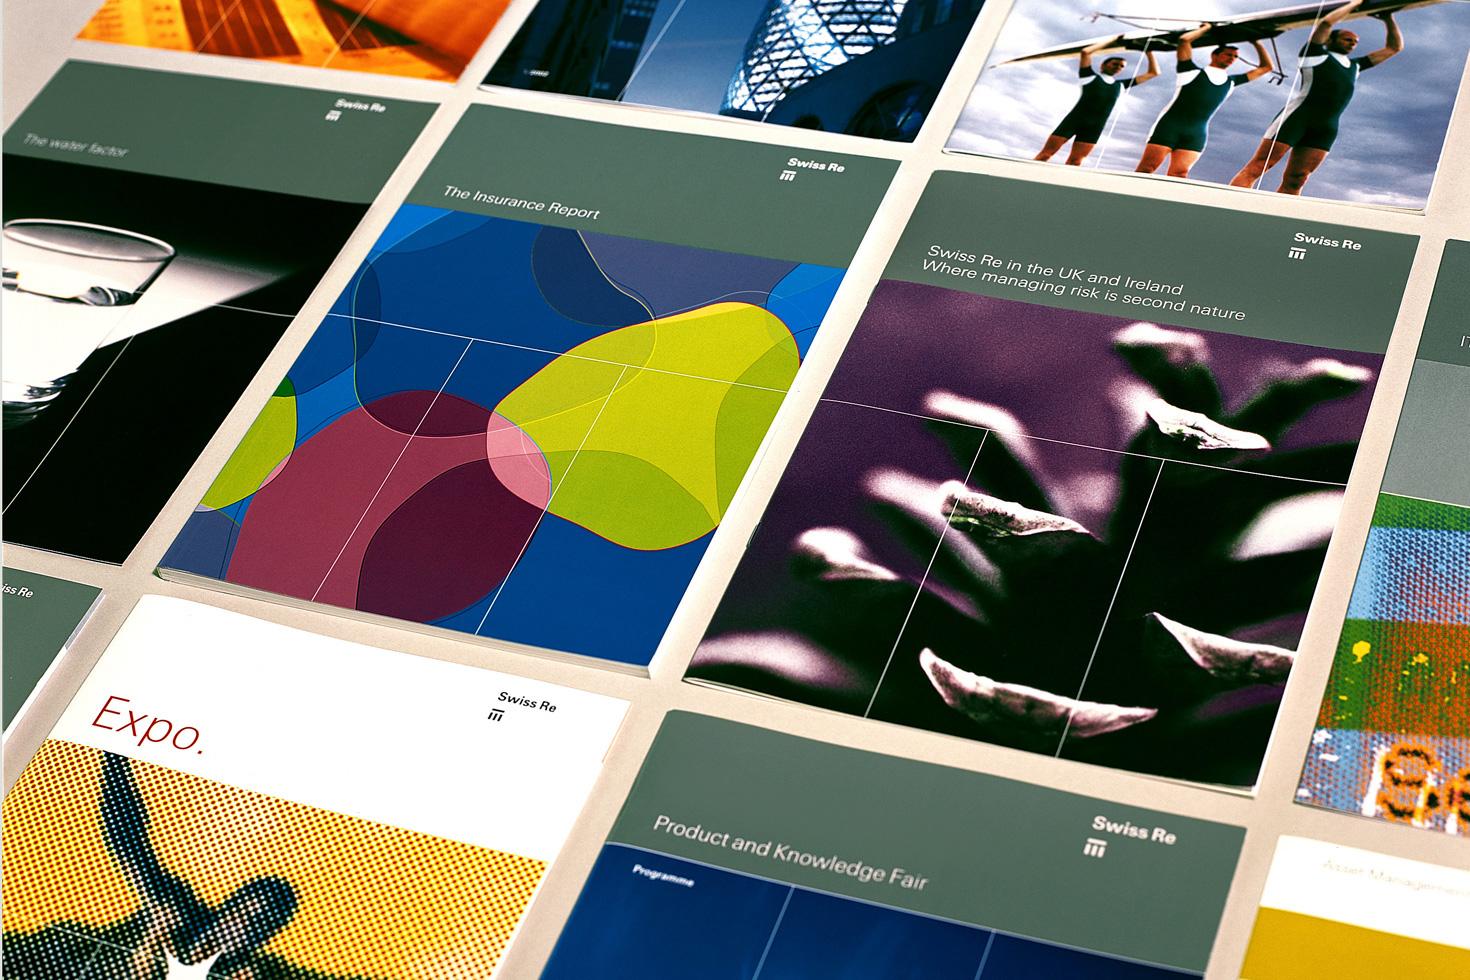 Swiss Re publications